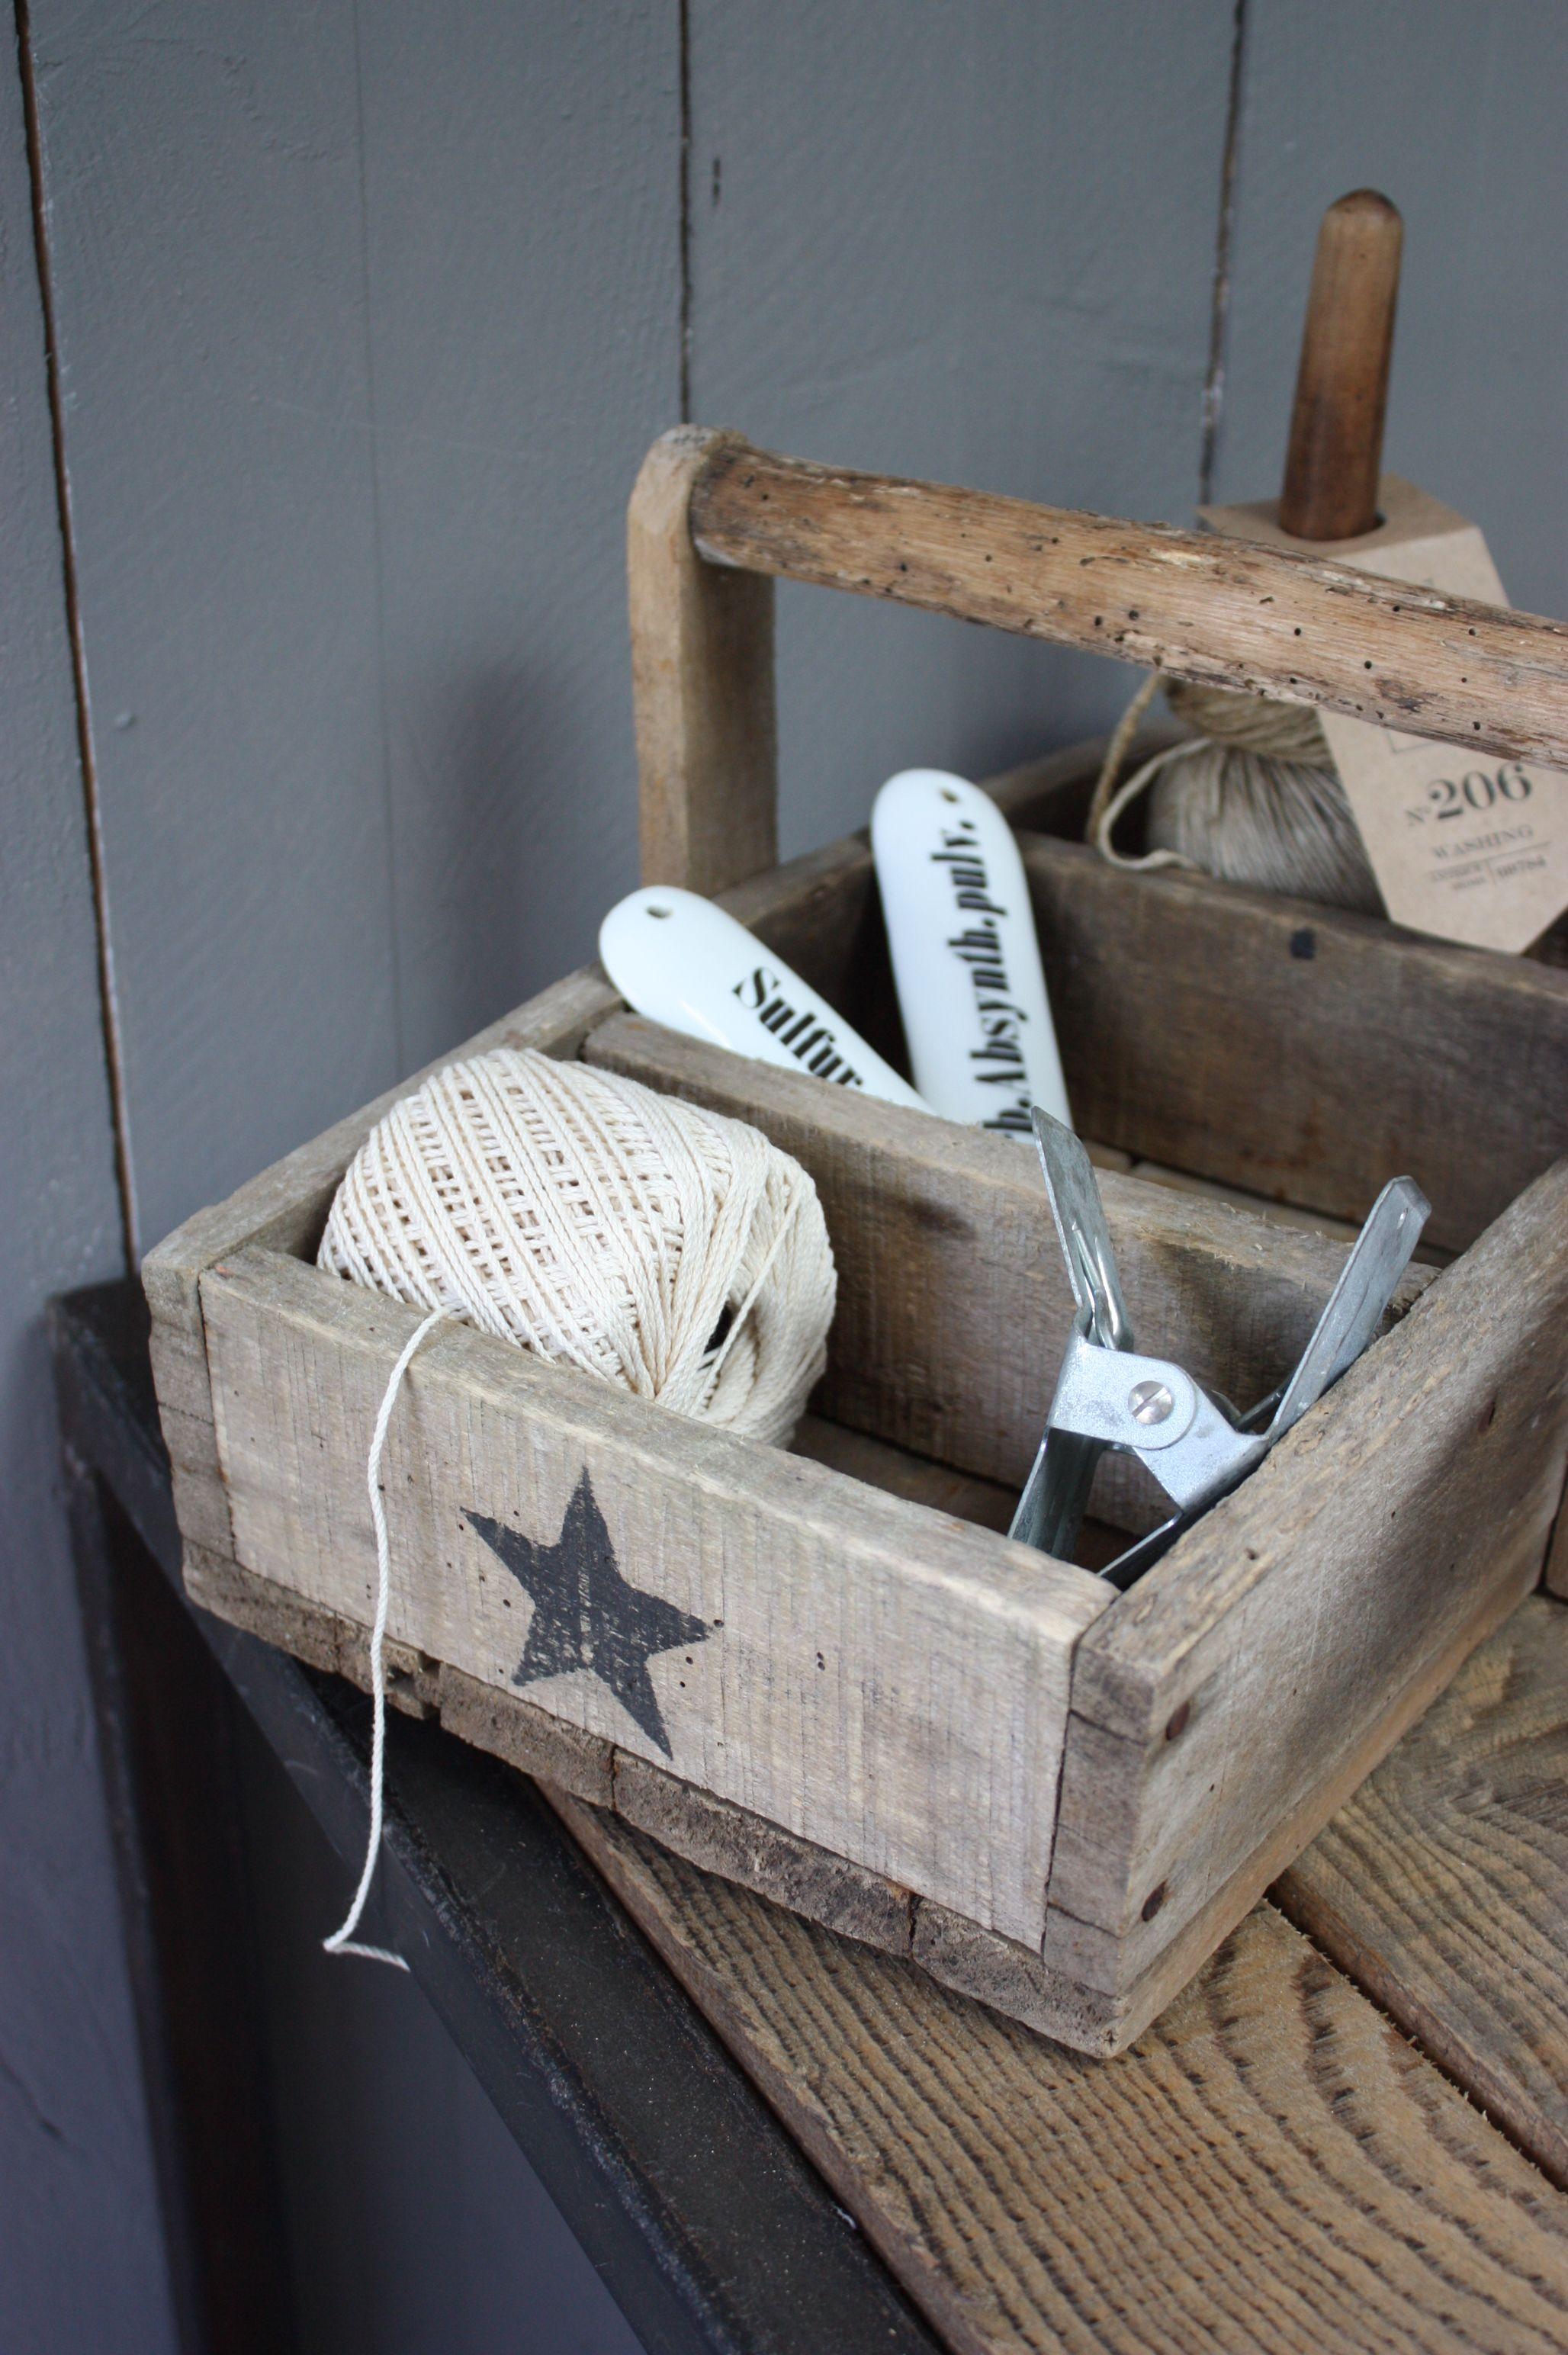 le grenier de ninon thuis met moon stars pinterest pallets star and box. Black Bedroom Furniture Sets. Home Design Ideas